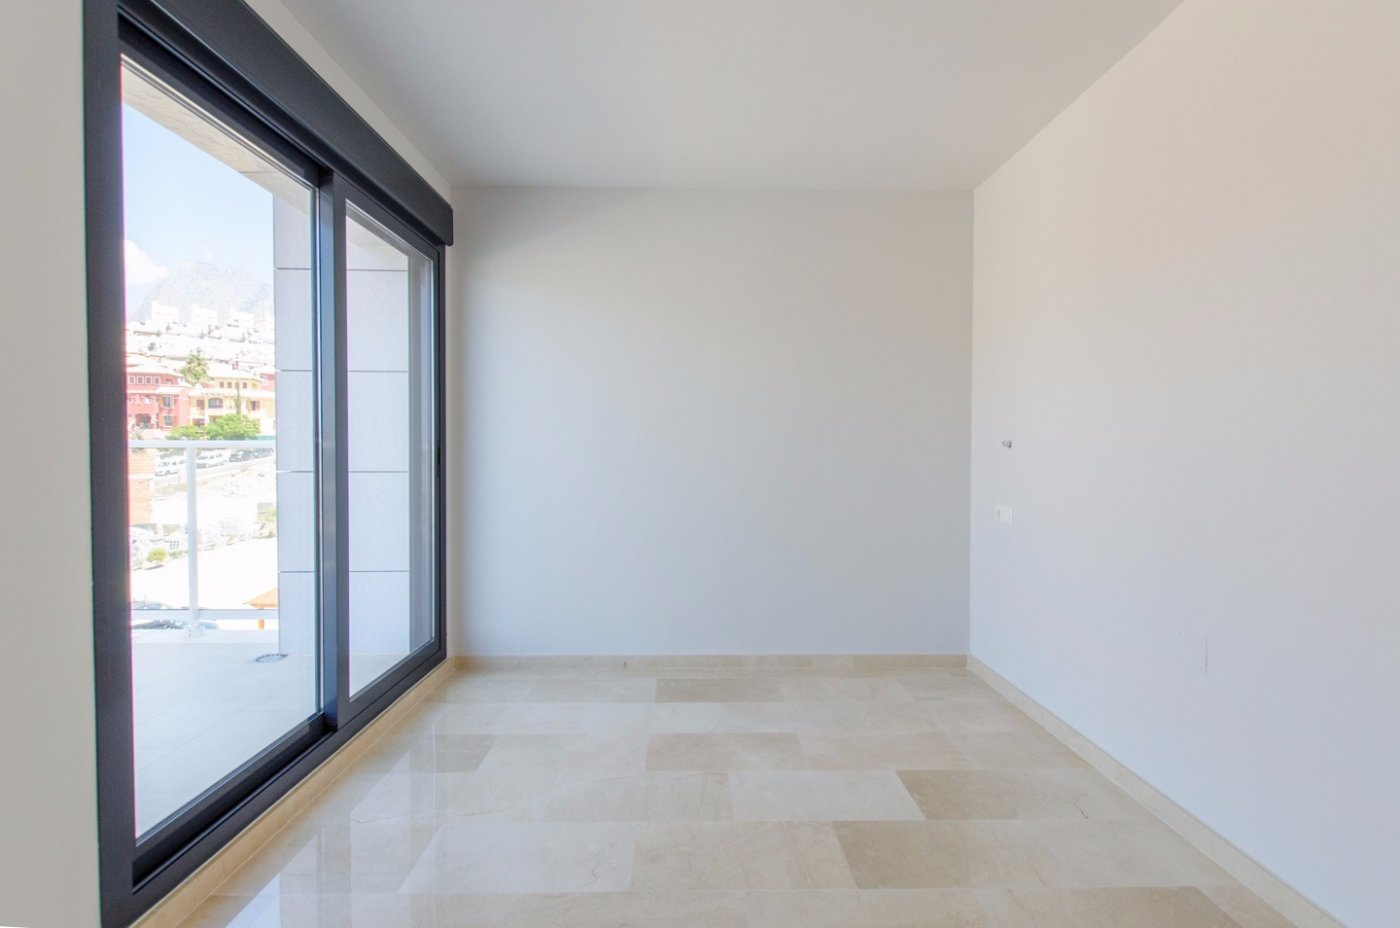 Villas modernas en balcÓn de finestrat a un paso de benidorm!!! - imagenInmueble20